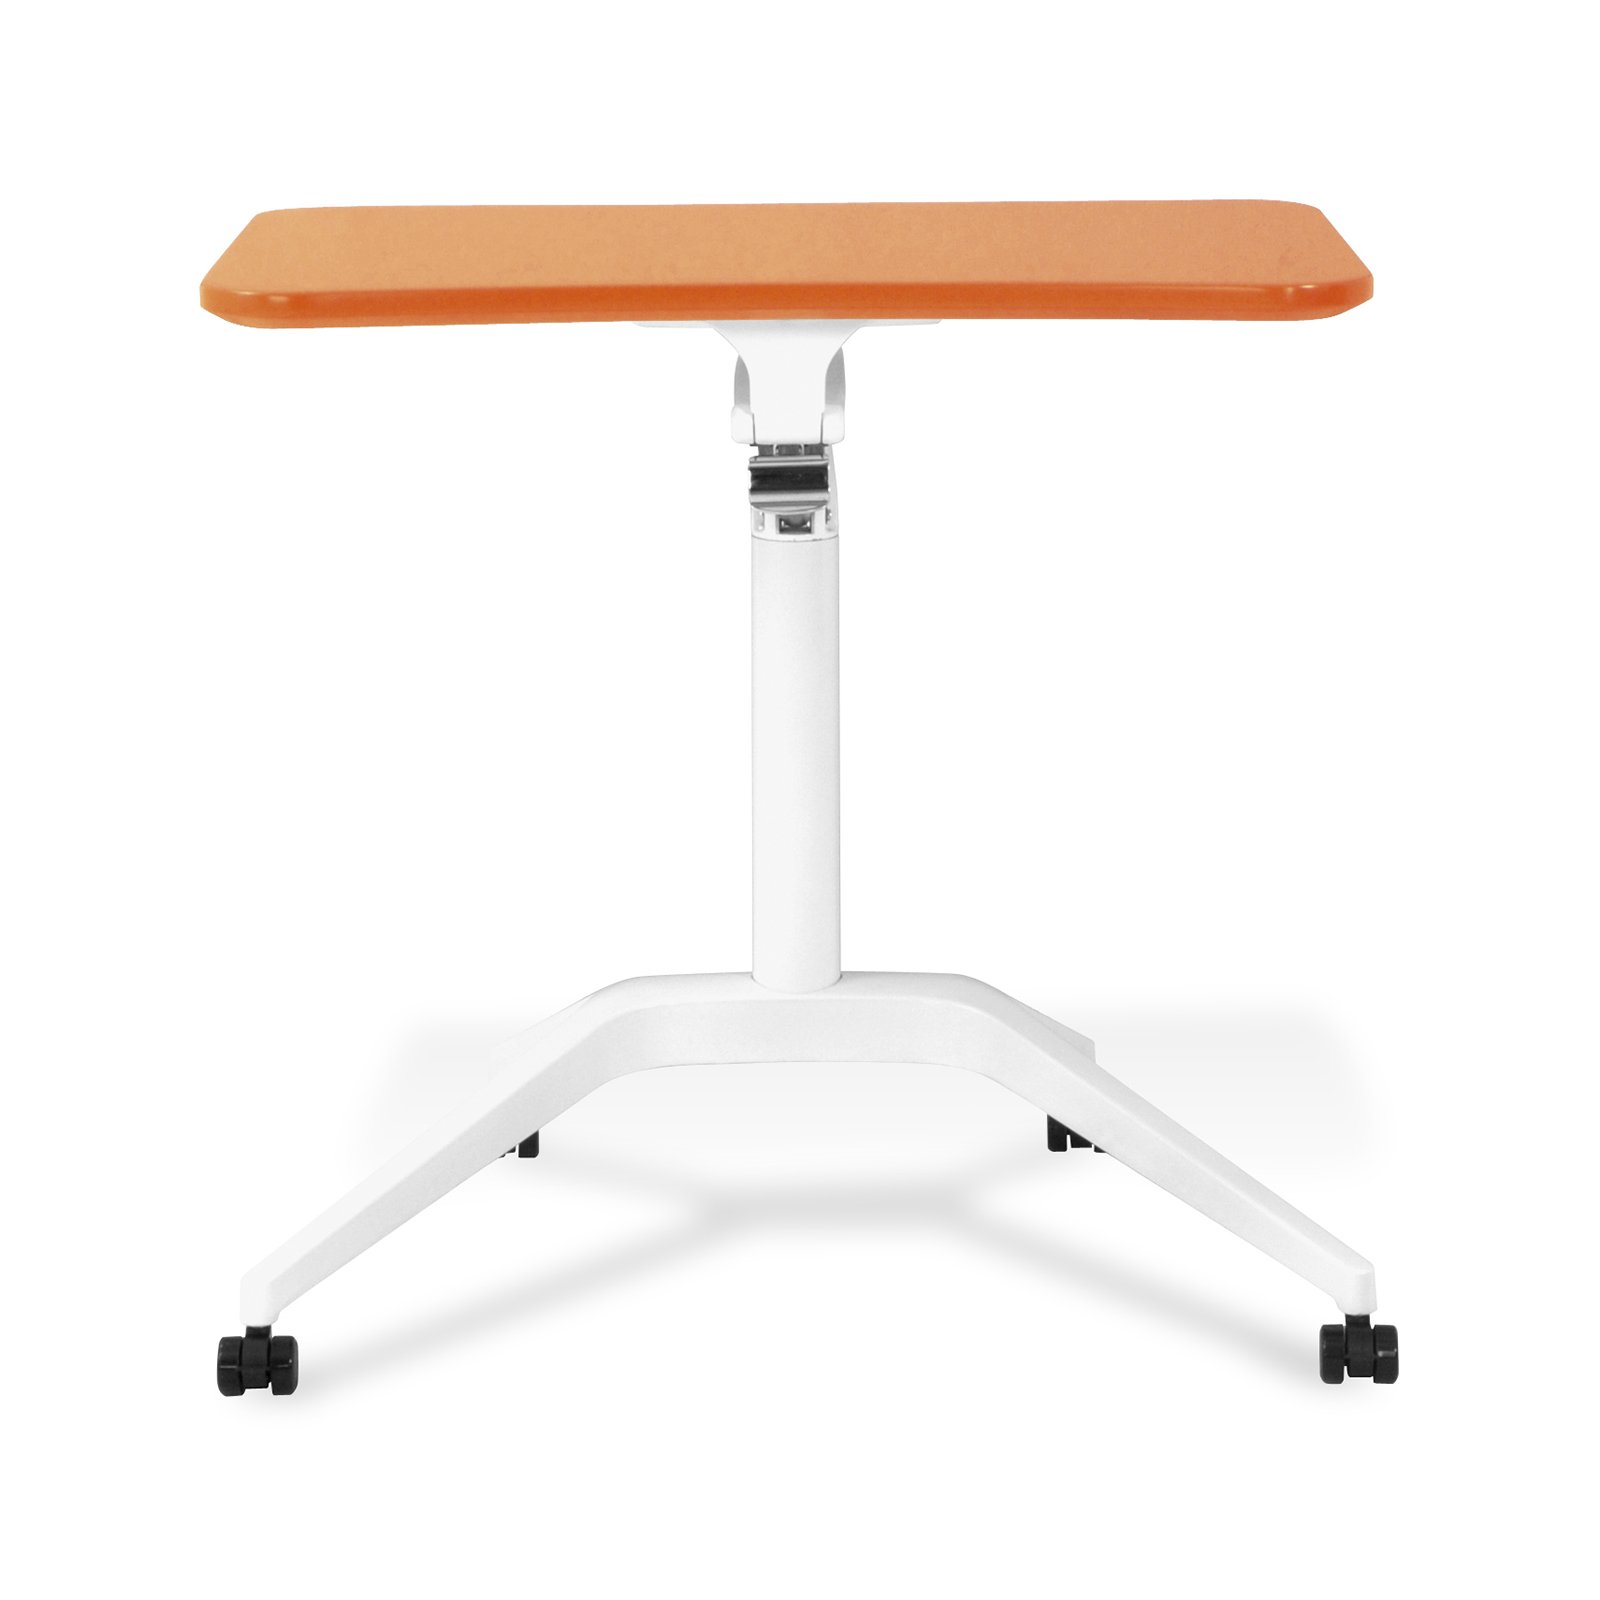 Unique Furniture 201-ORA Workpad Height Adjustable Laptop Cart Mobile Desk, with Orange Top by Unique Furniture